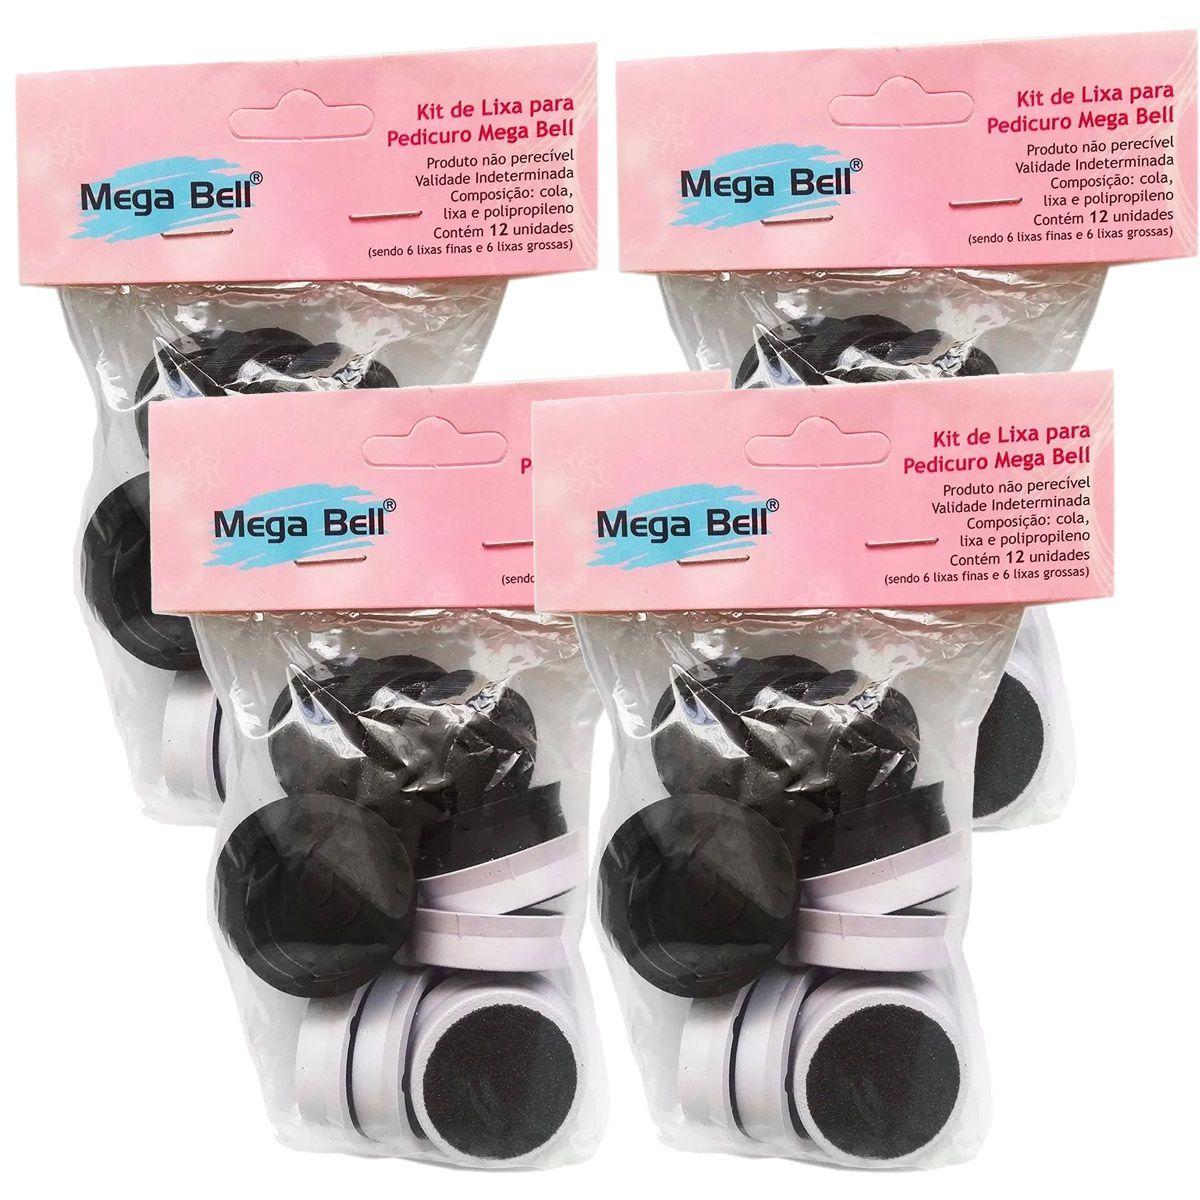 4 Refil Lixa Pedicuro Megabell - 48 Lixas